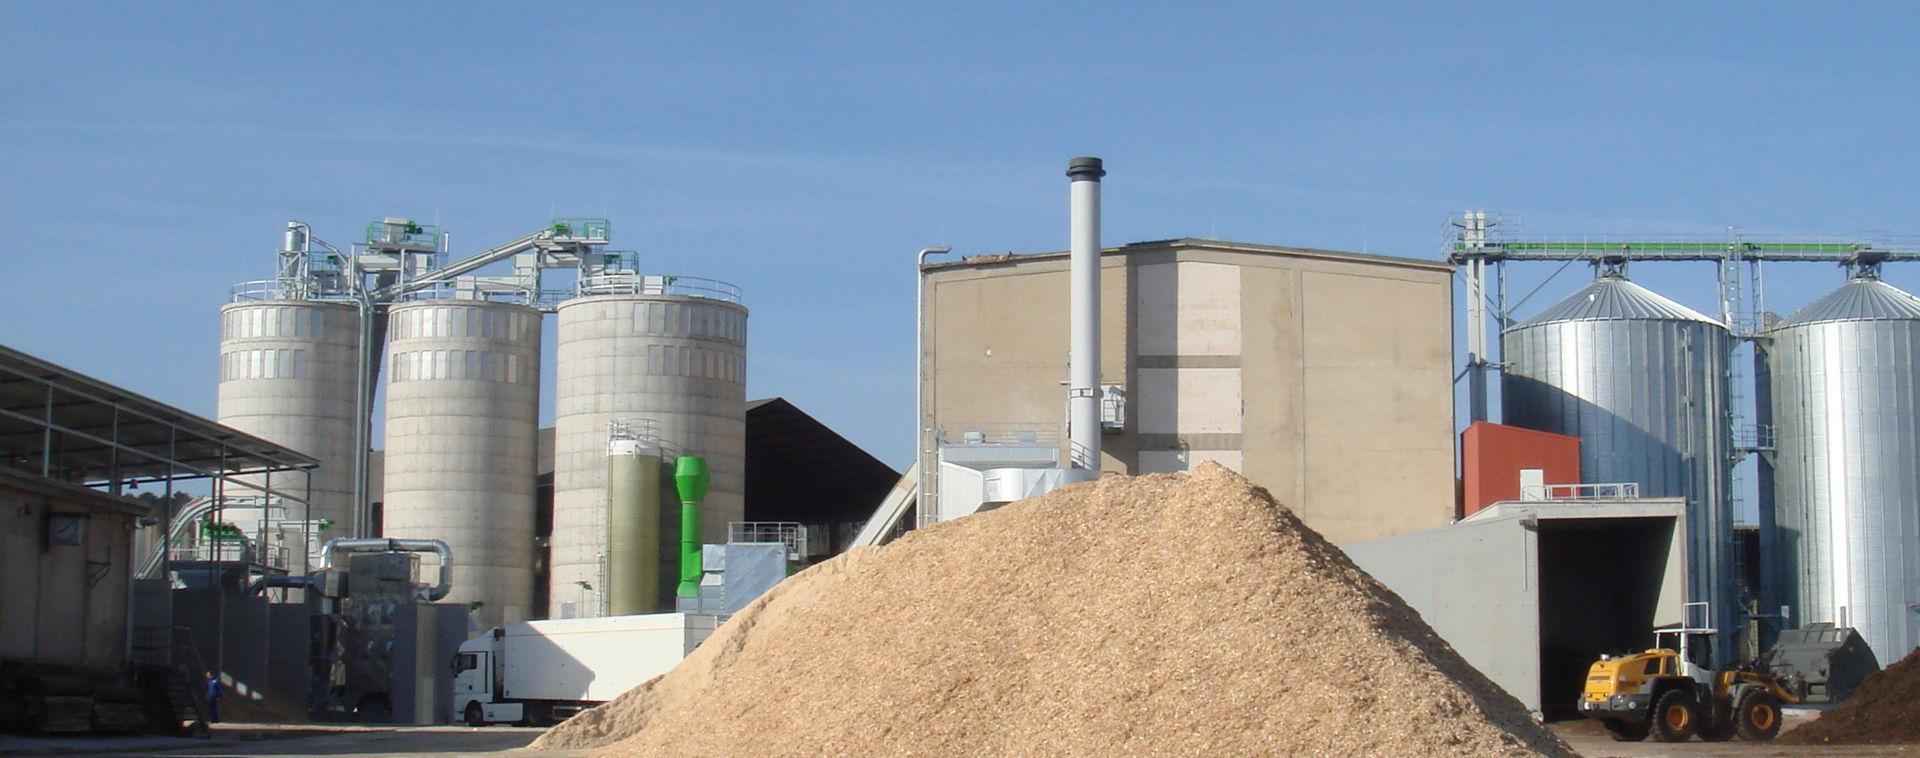 Ec Bioenergie Gmbh Amp Co Kg